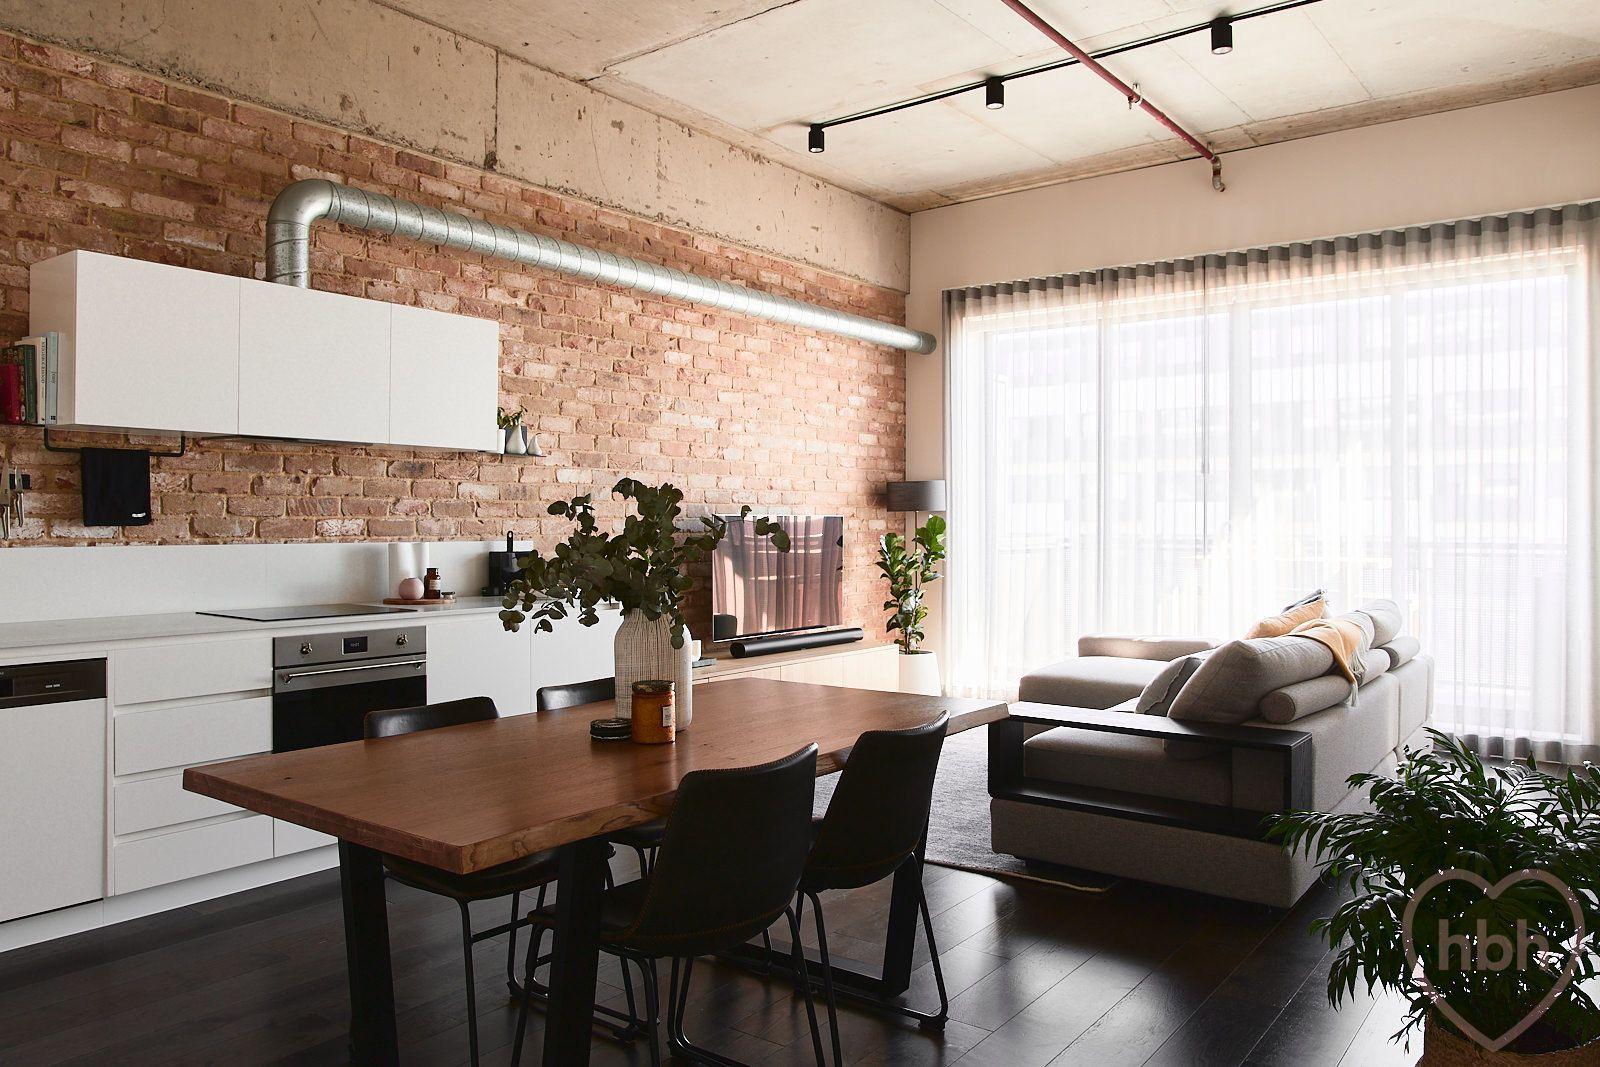 2 bedrooms Apartment / Unit / Flat in 605/45 Furzer Street PHILLIP ACT, 2606